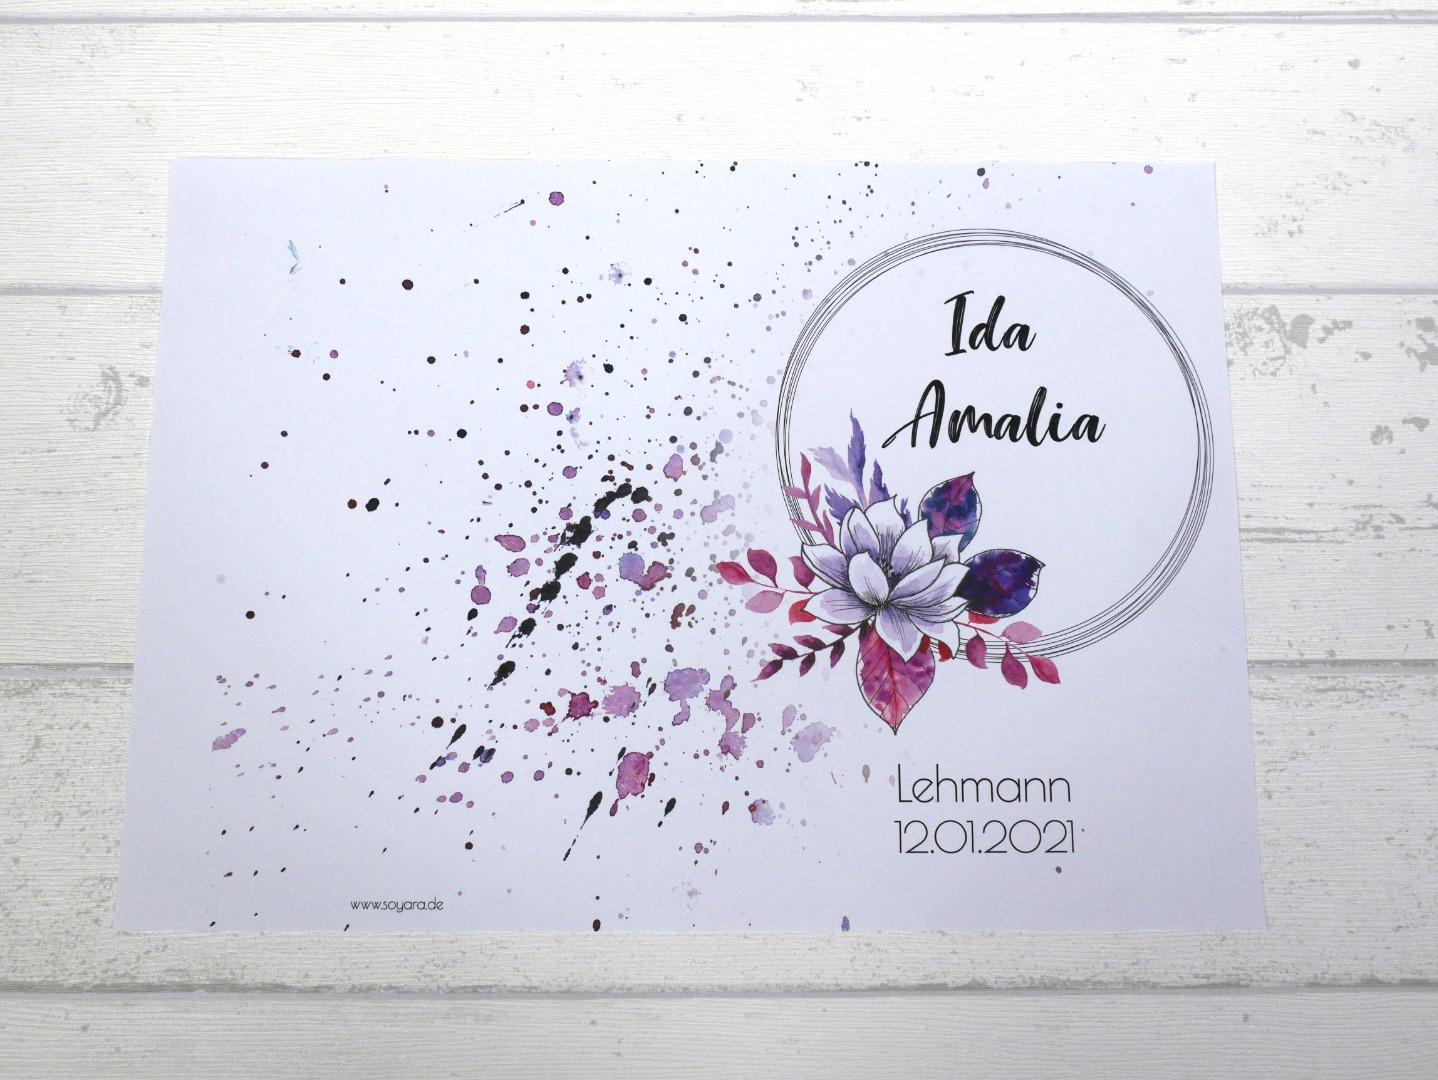 U-Heft Hülle Watercolor Blumen mit Impfpass